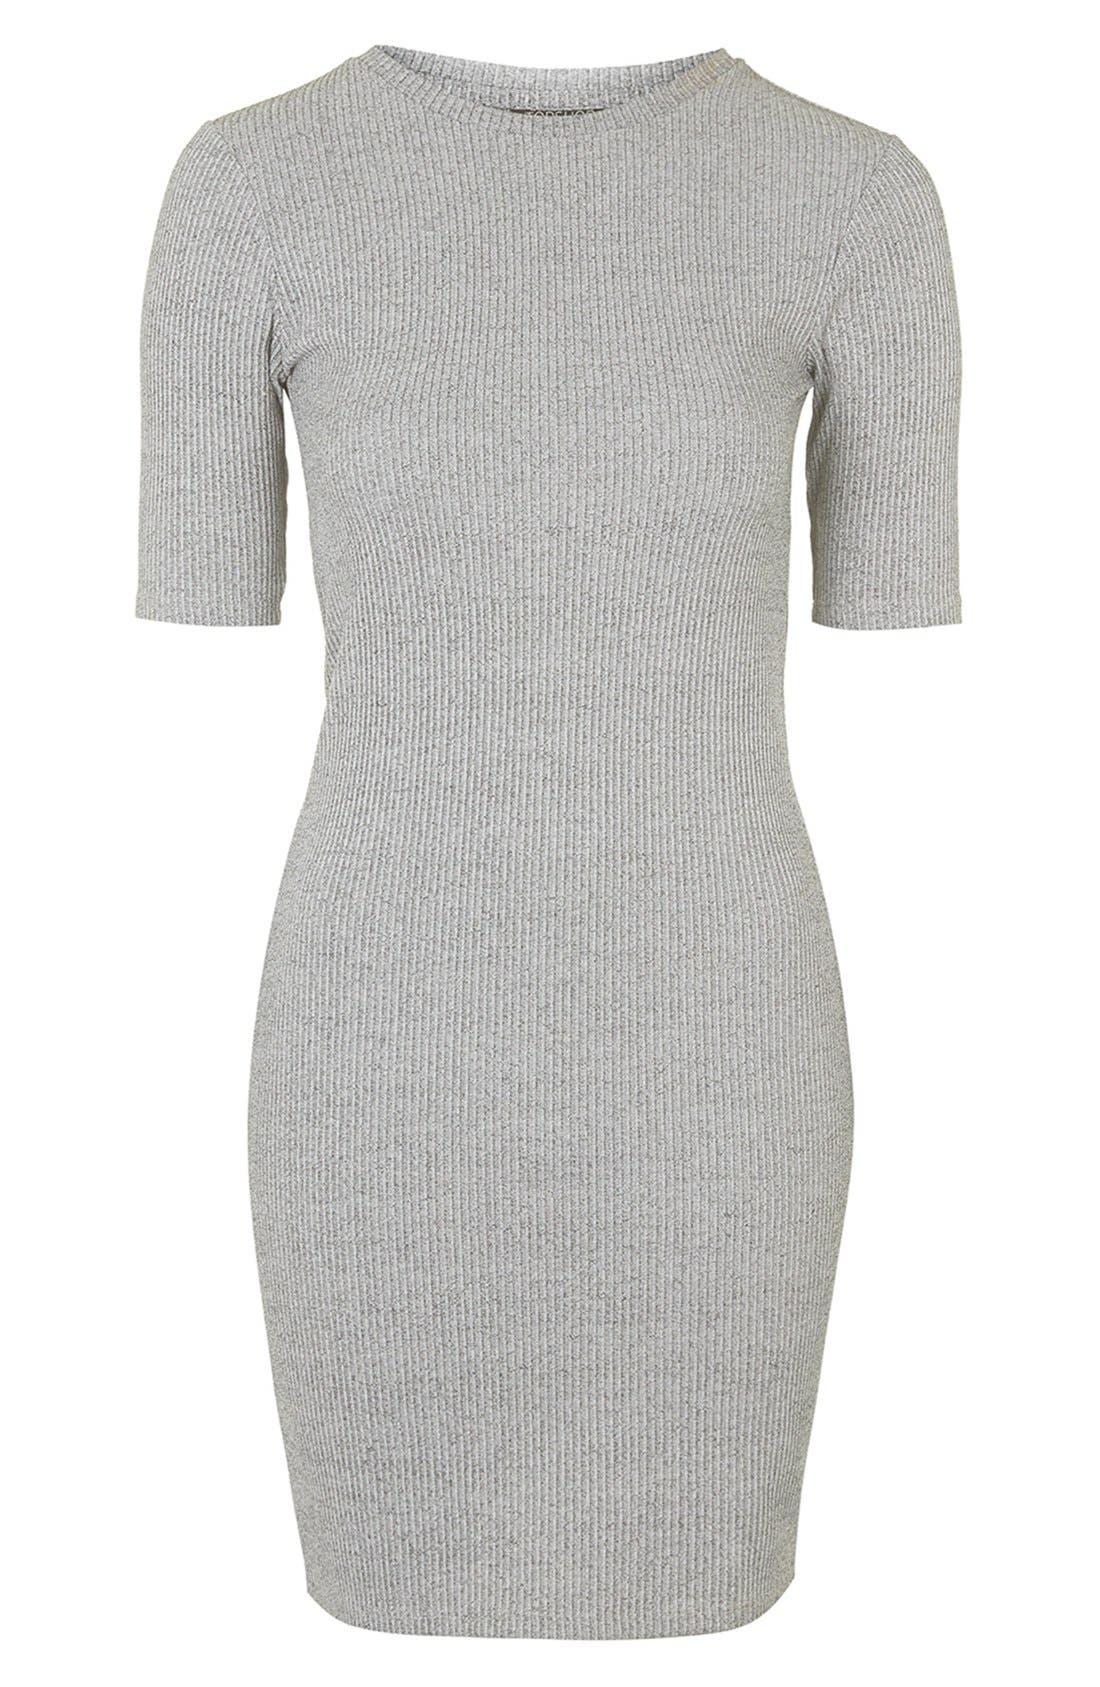 Main Image - Topshop Half Sleeve Ribbed Body-Con Dress